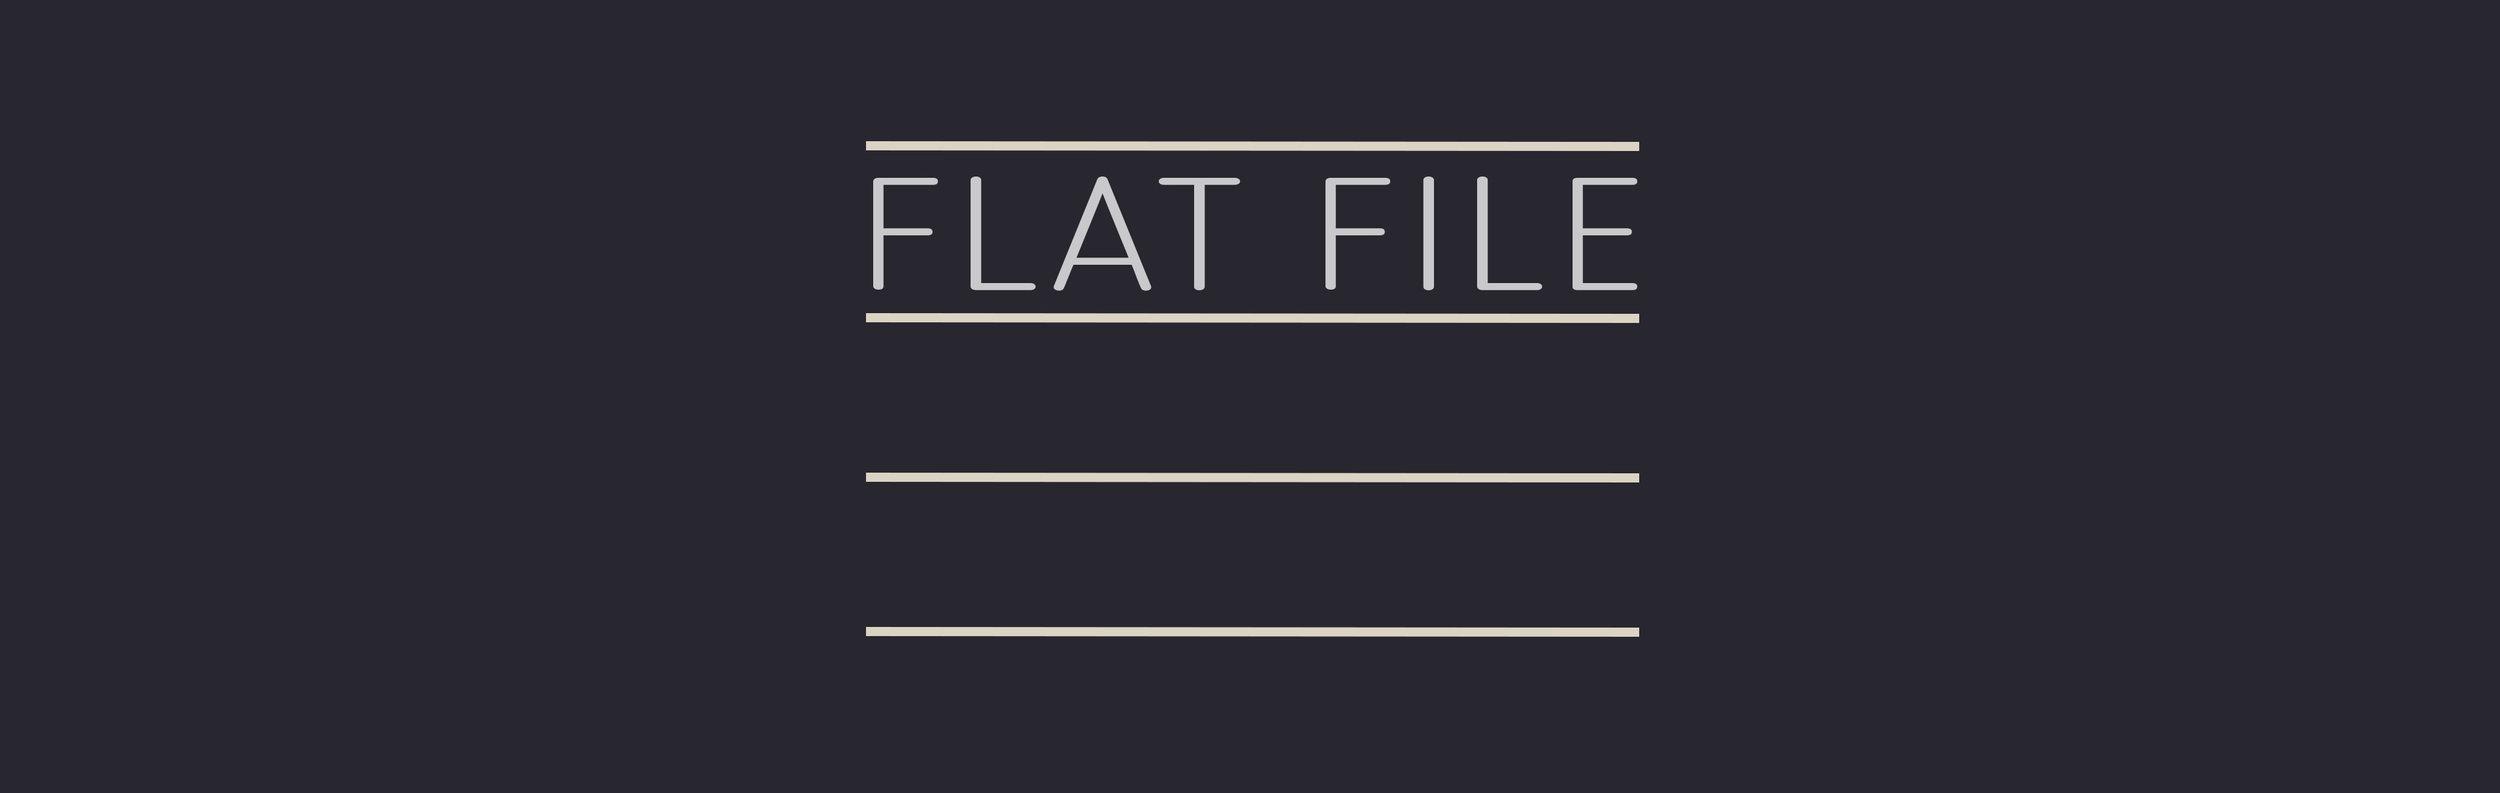 Flat File Benefit Show1.jpg